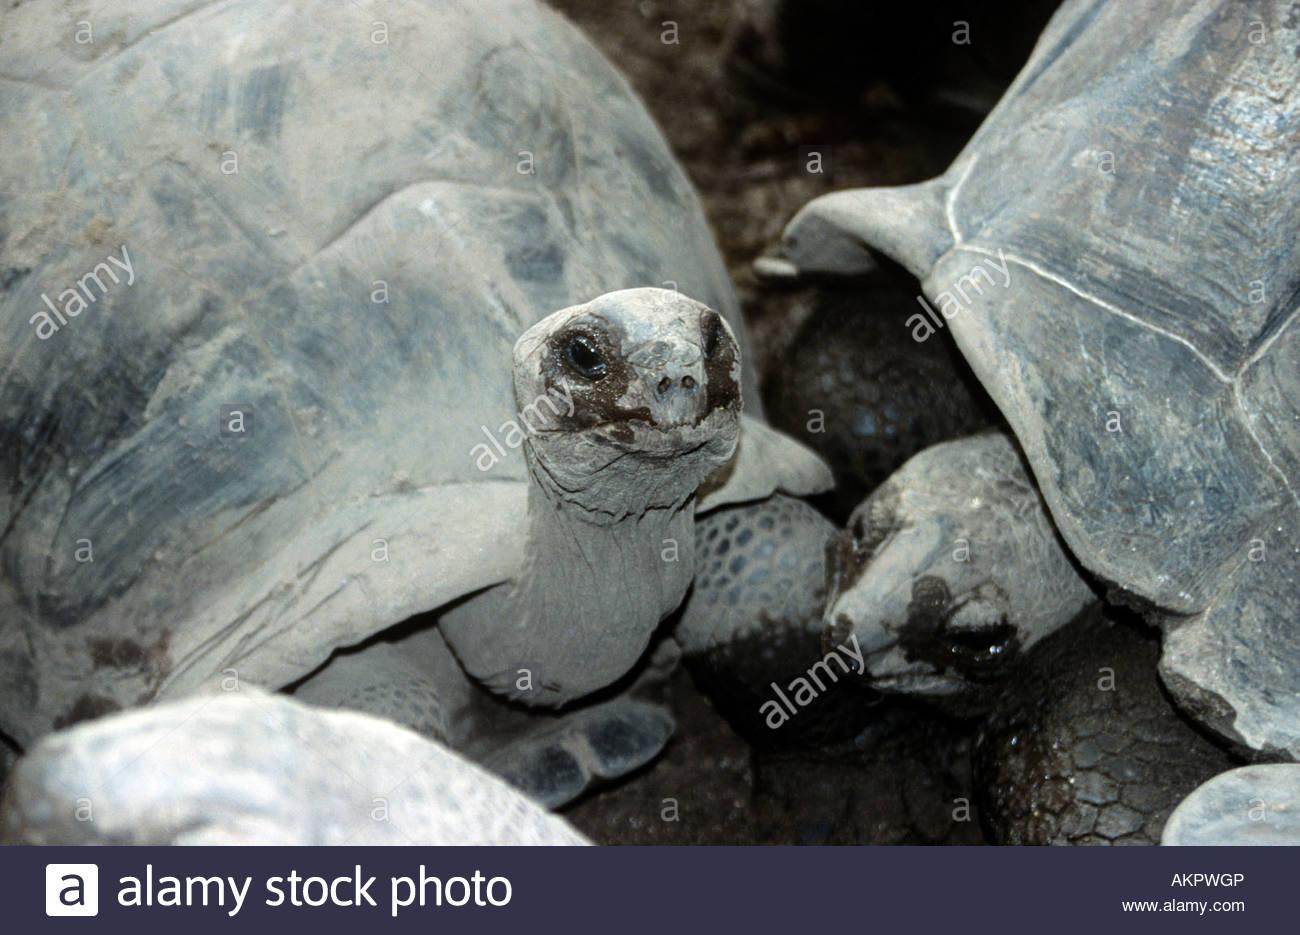 Giant tortoises - Stock Image